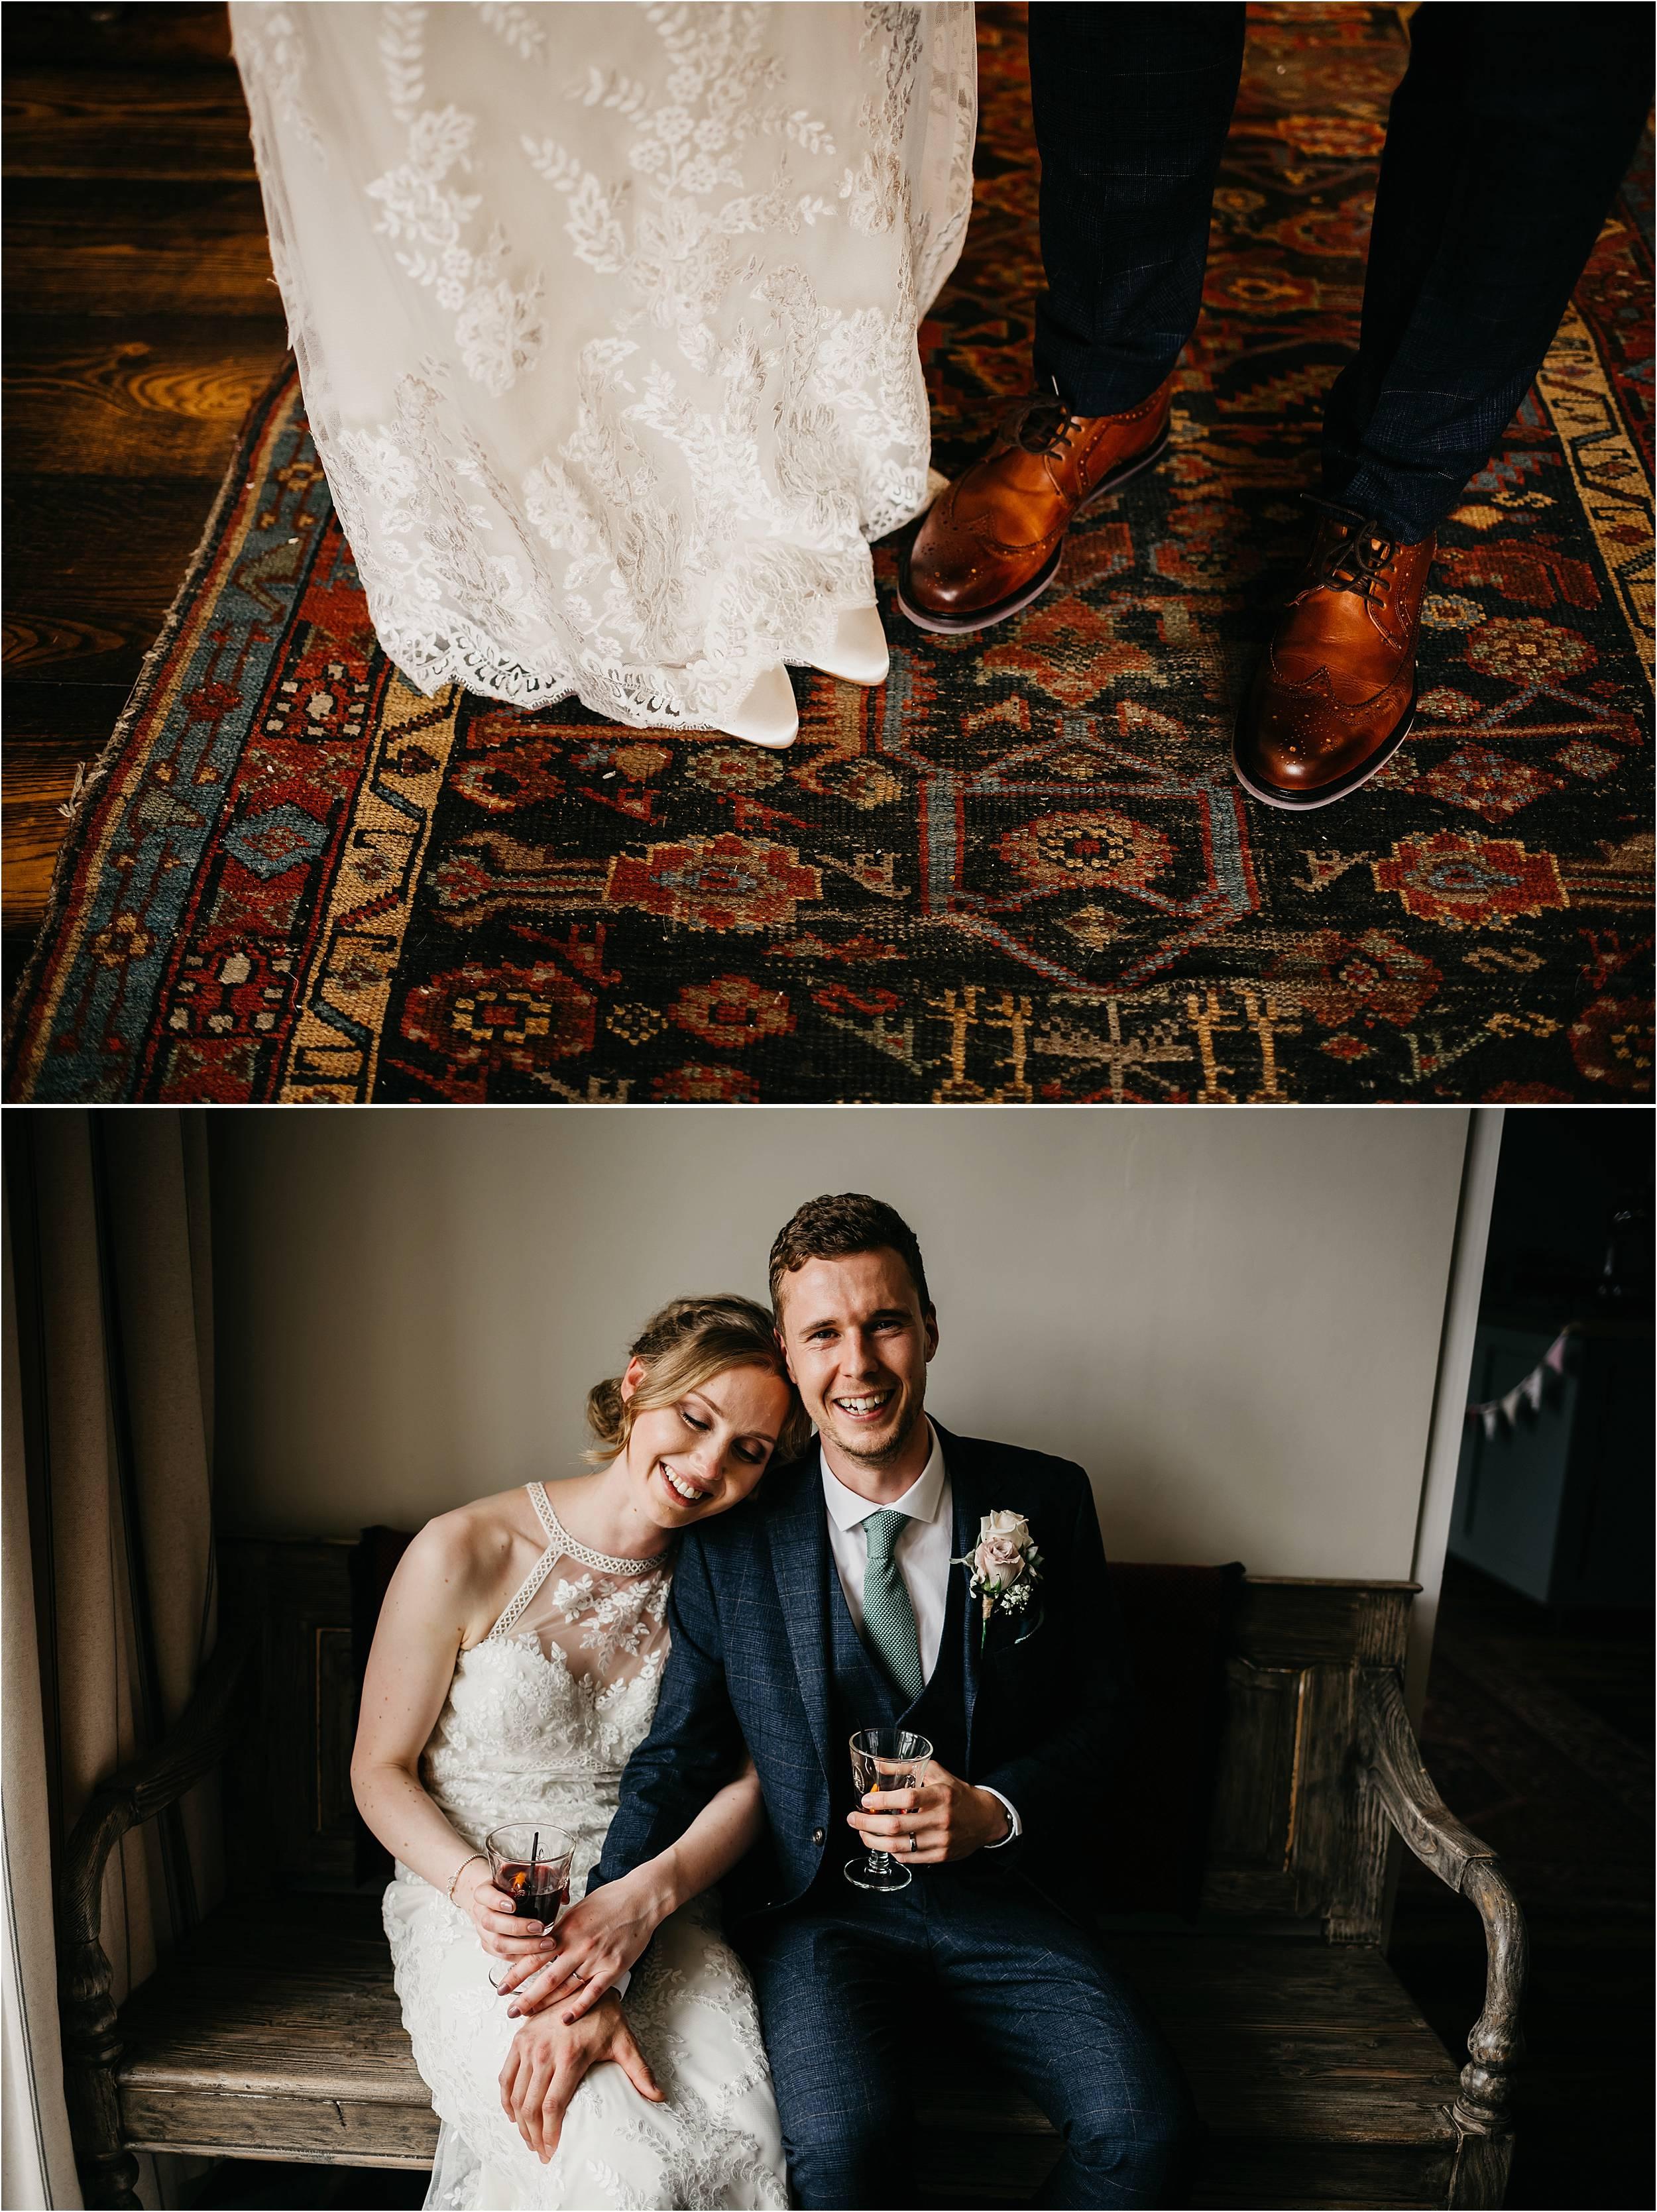 Kedleston Country House Wedding Photography_0053.jpg